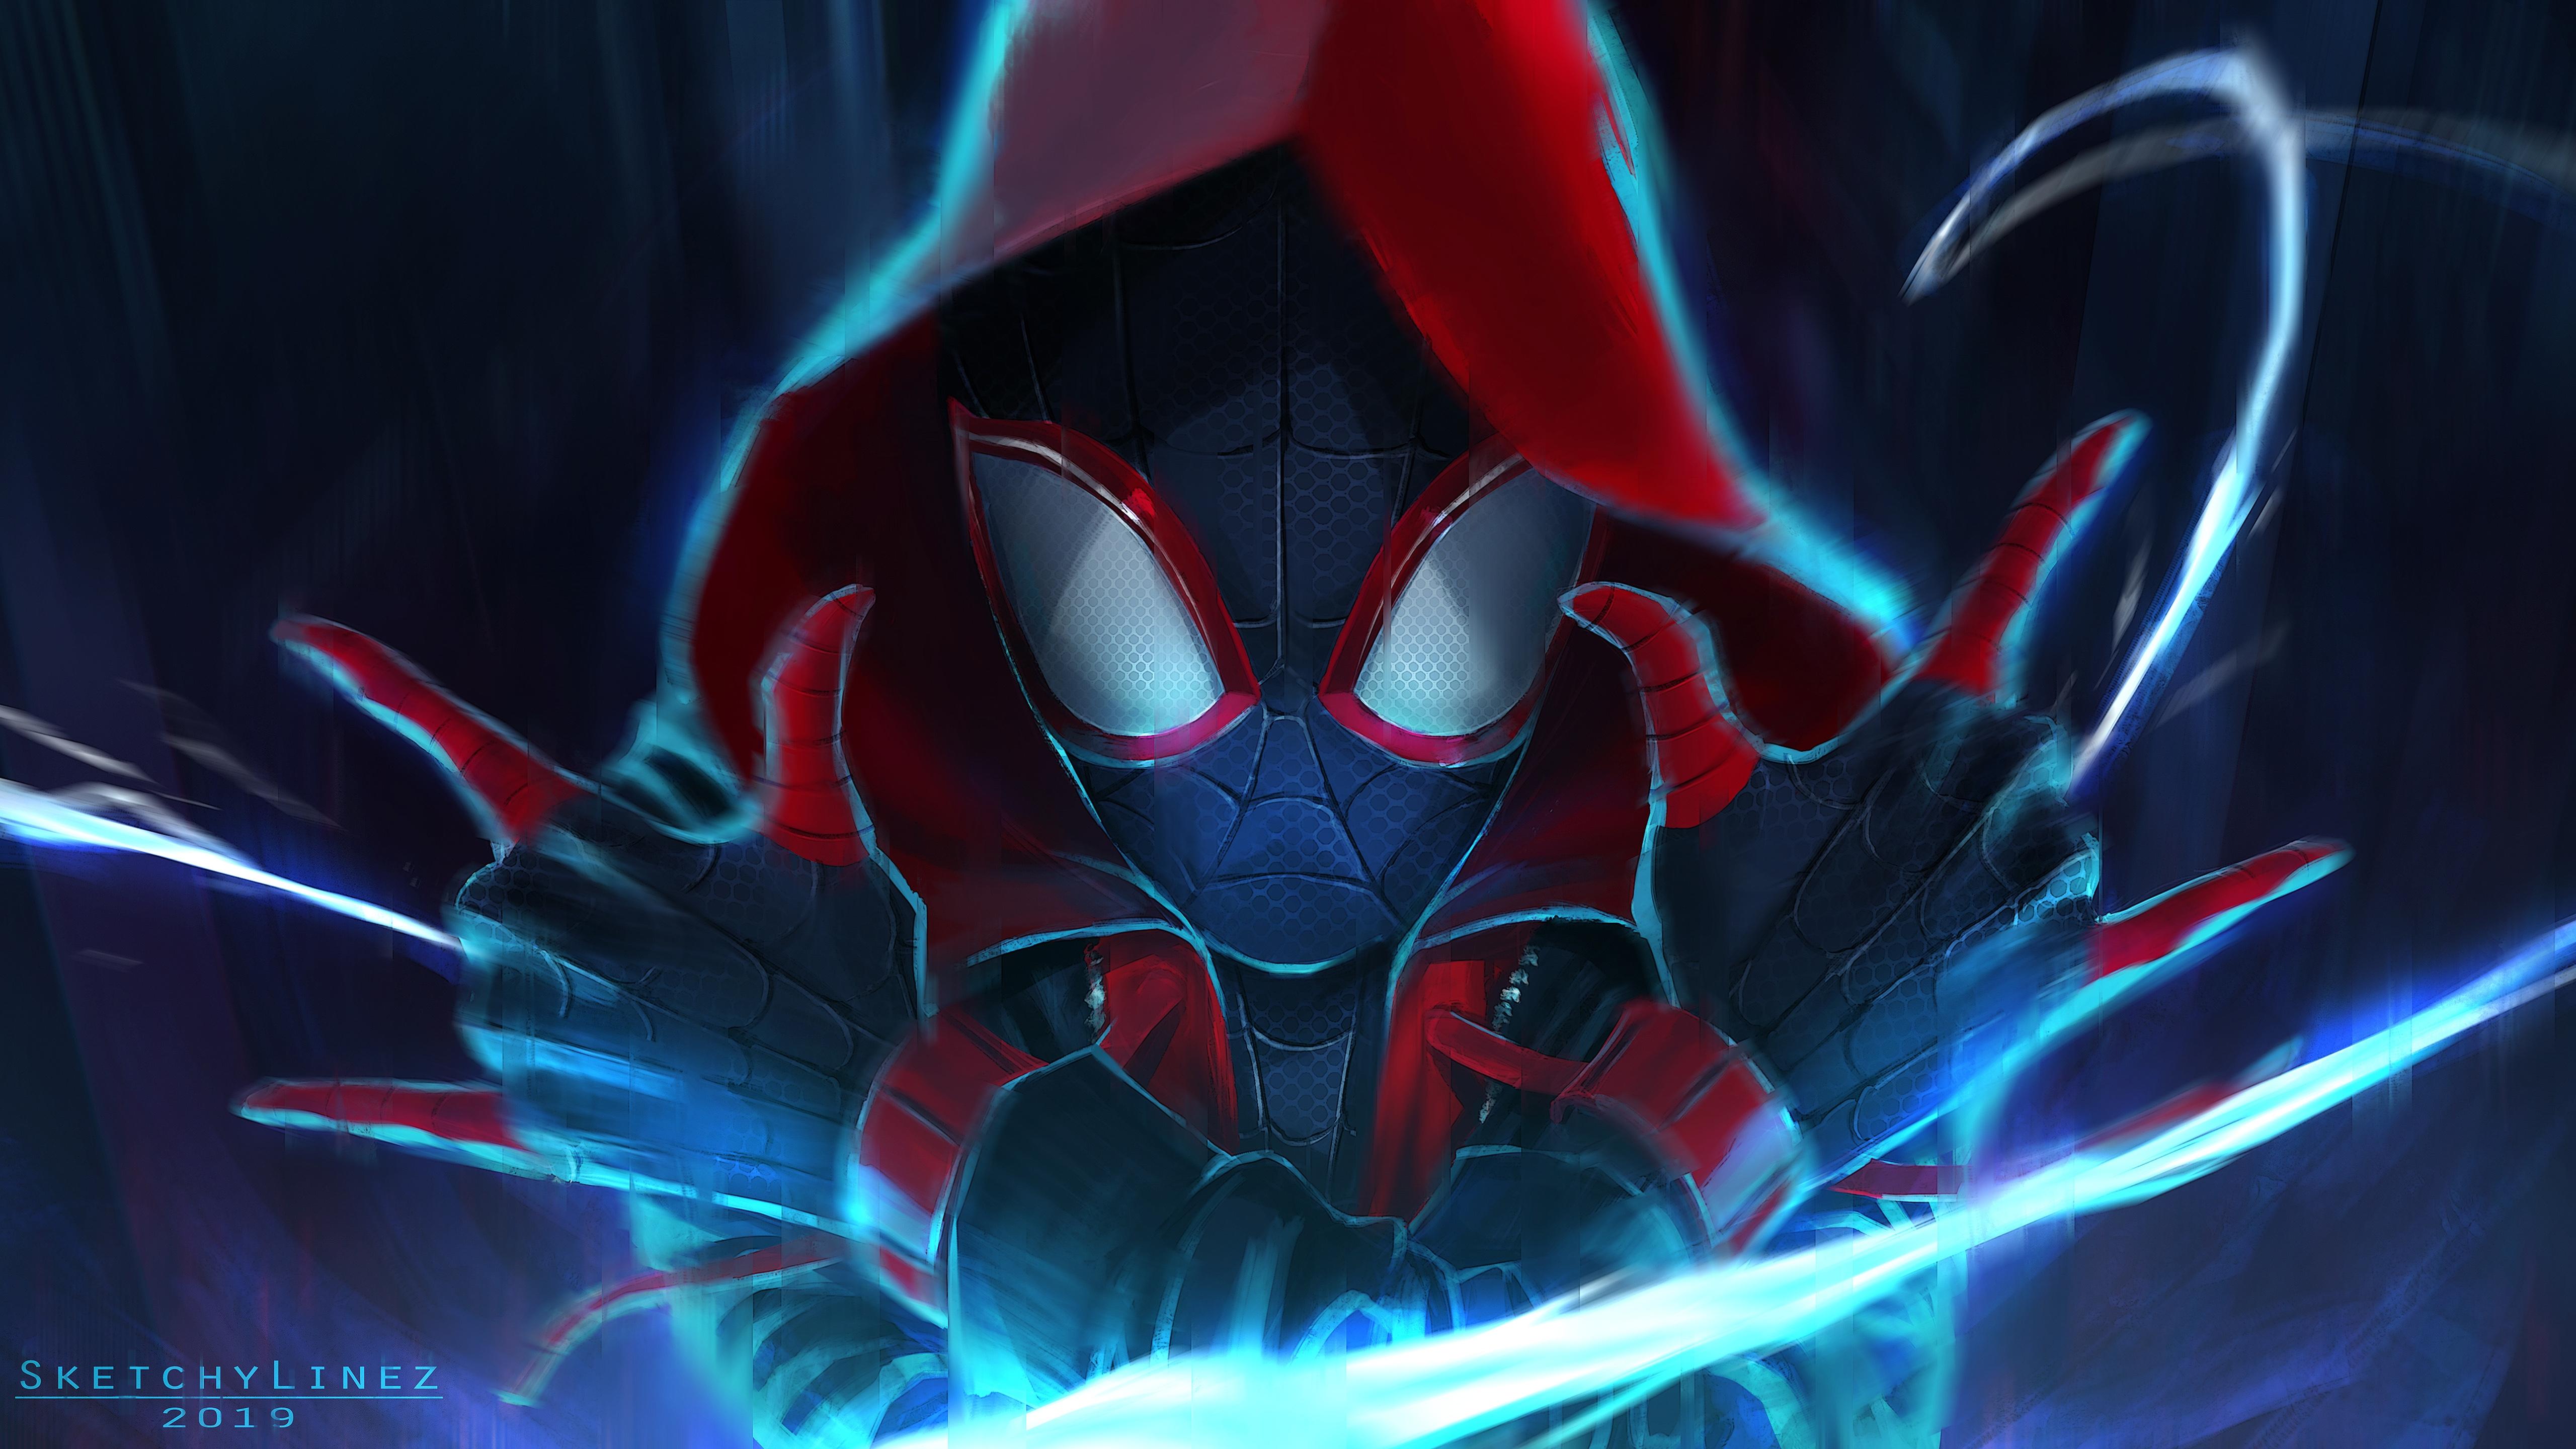 General 5120x2880 Spider-Man Spider-Man: Into the Spider-Verse artwork digital art Marvel Comics fan art hood hoods cyan frontal view